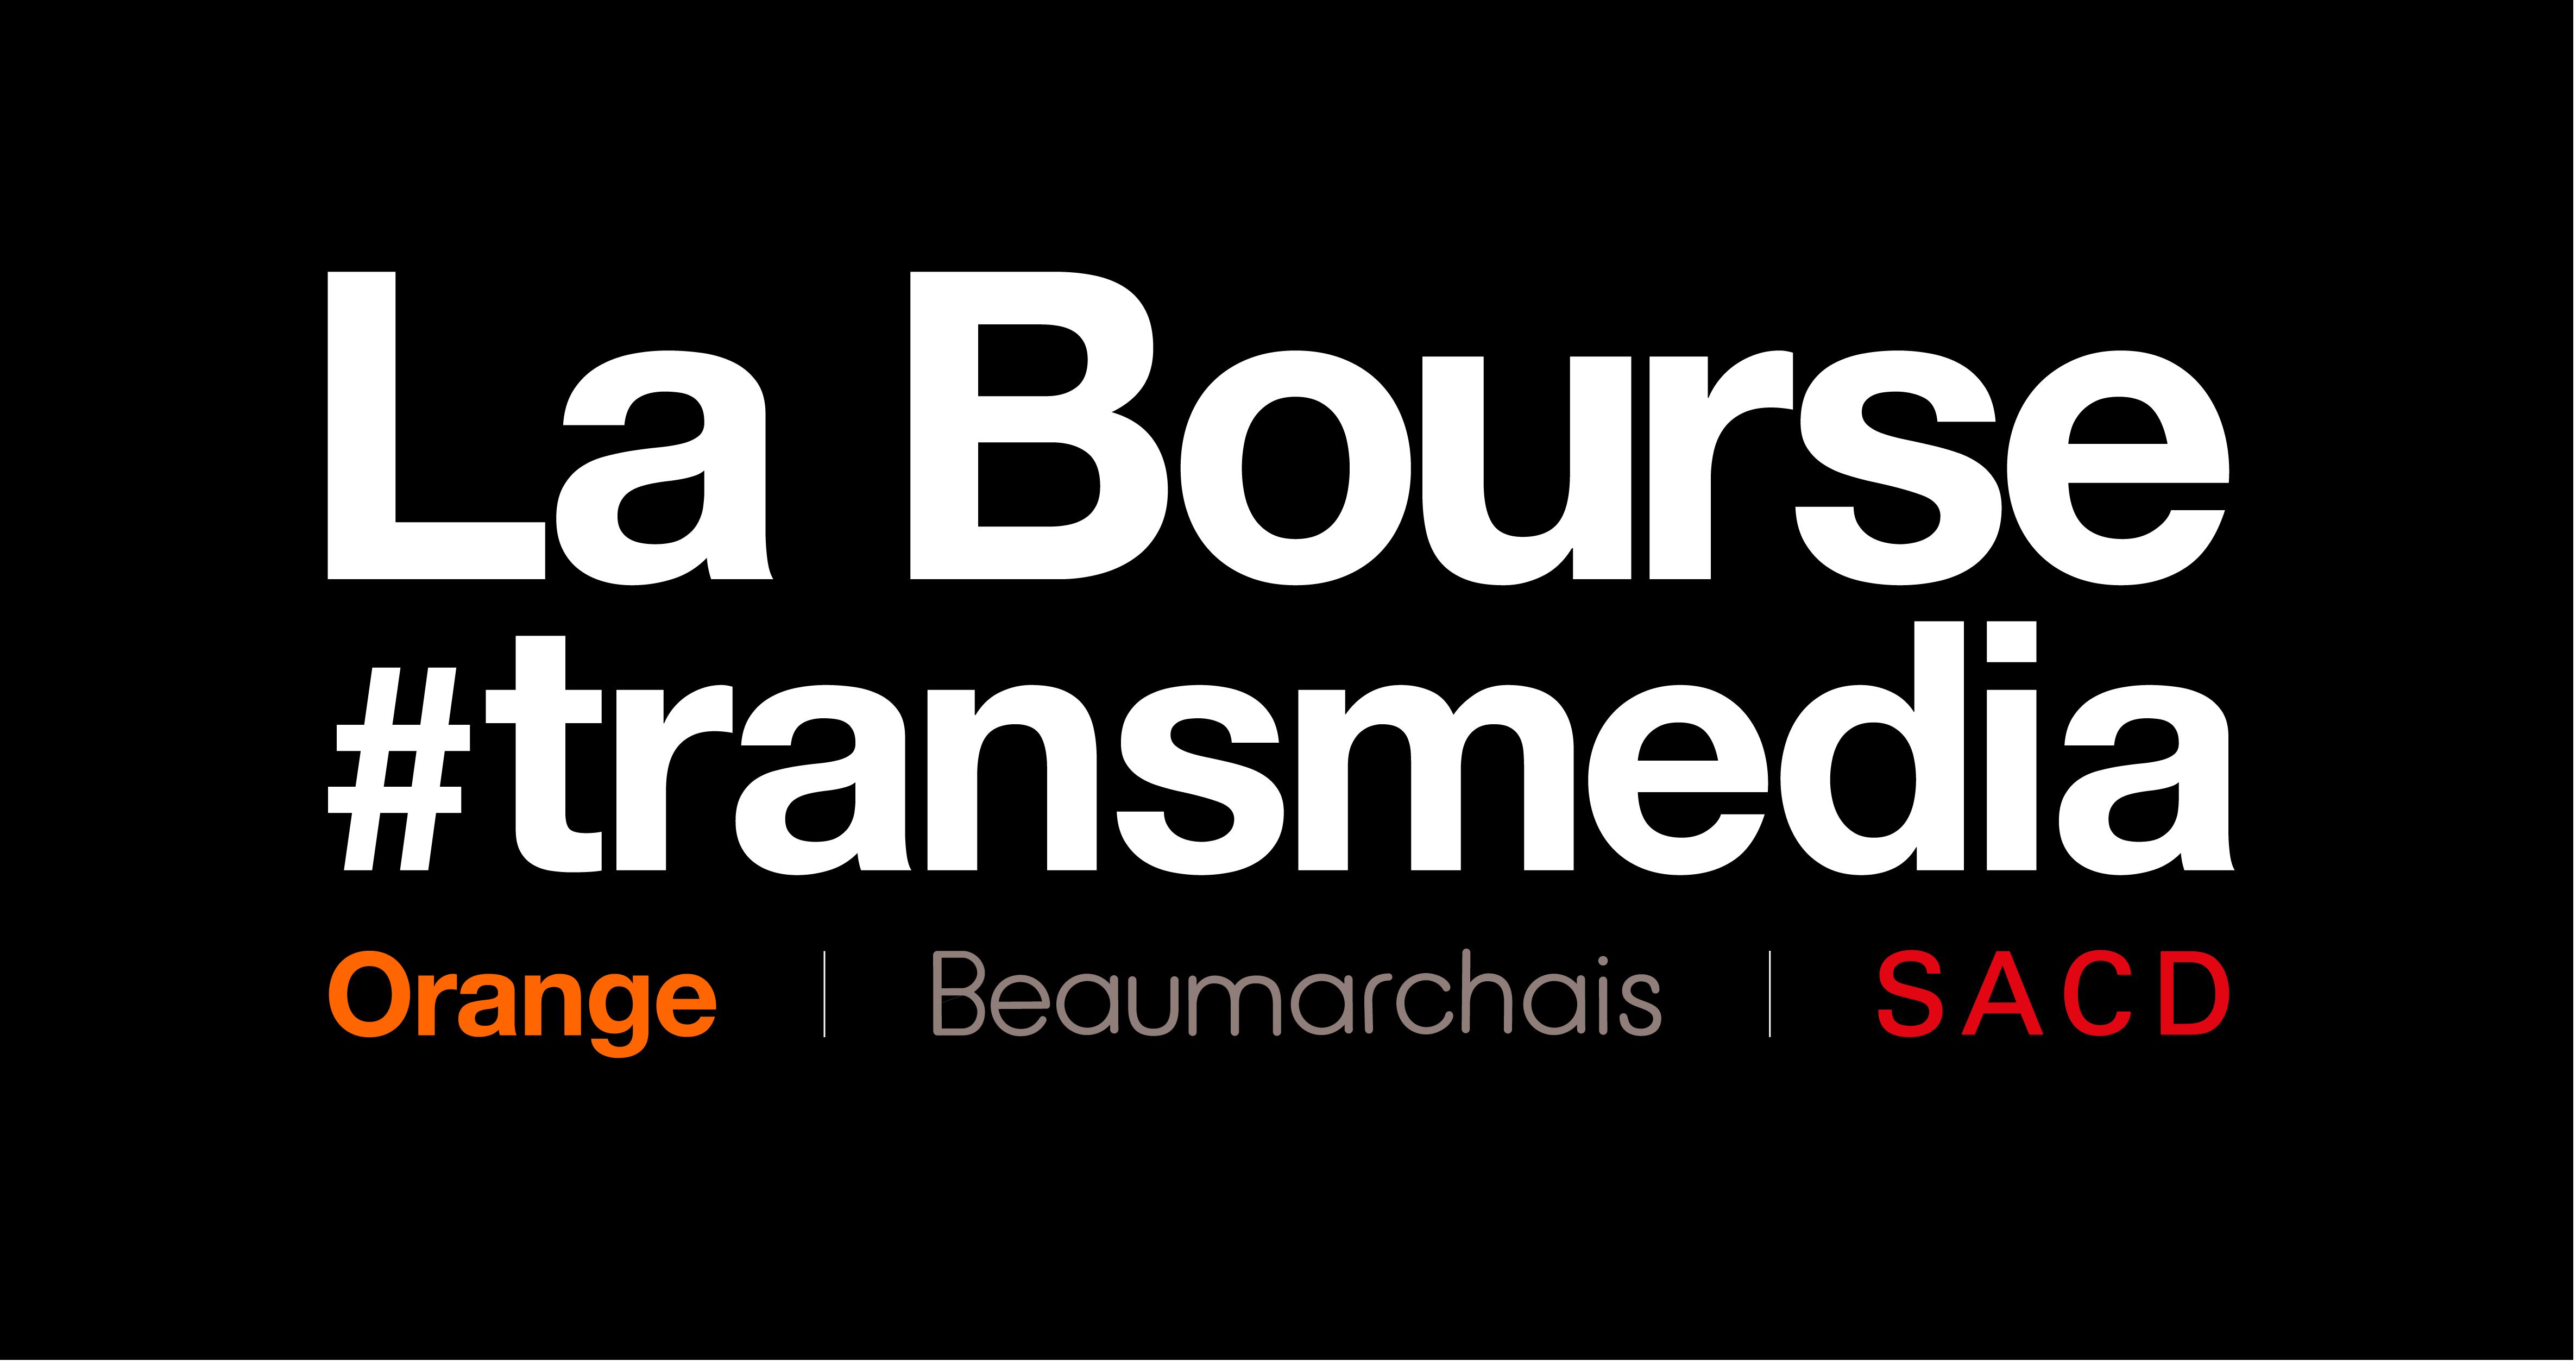 La Bourse #transmedia